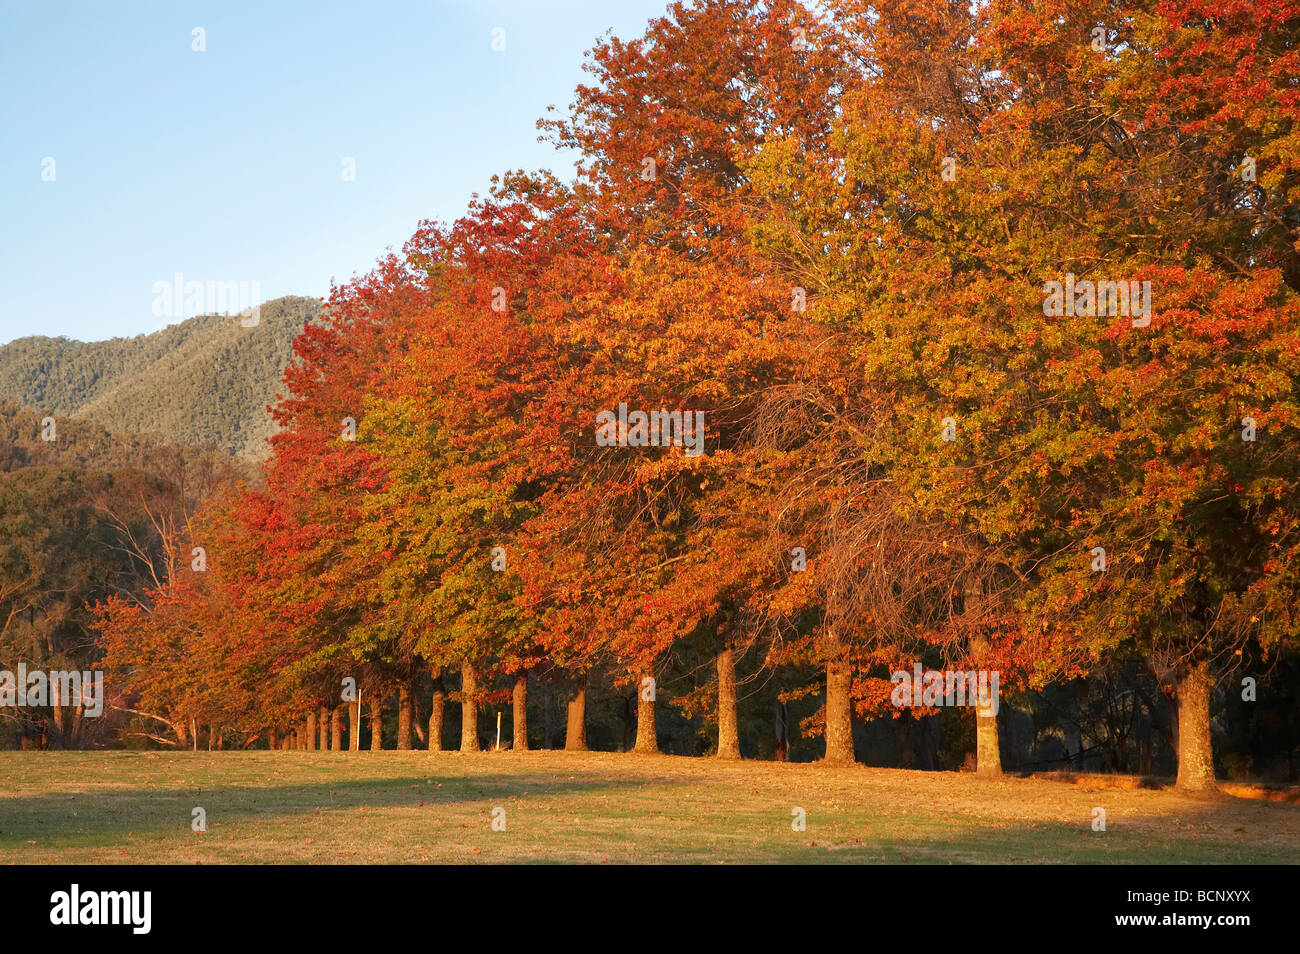 Herbst Bäume Ökonomie Snowy Mountains südlichen New South Wales Australien Stockbild